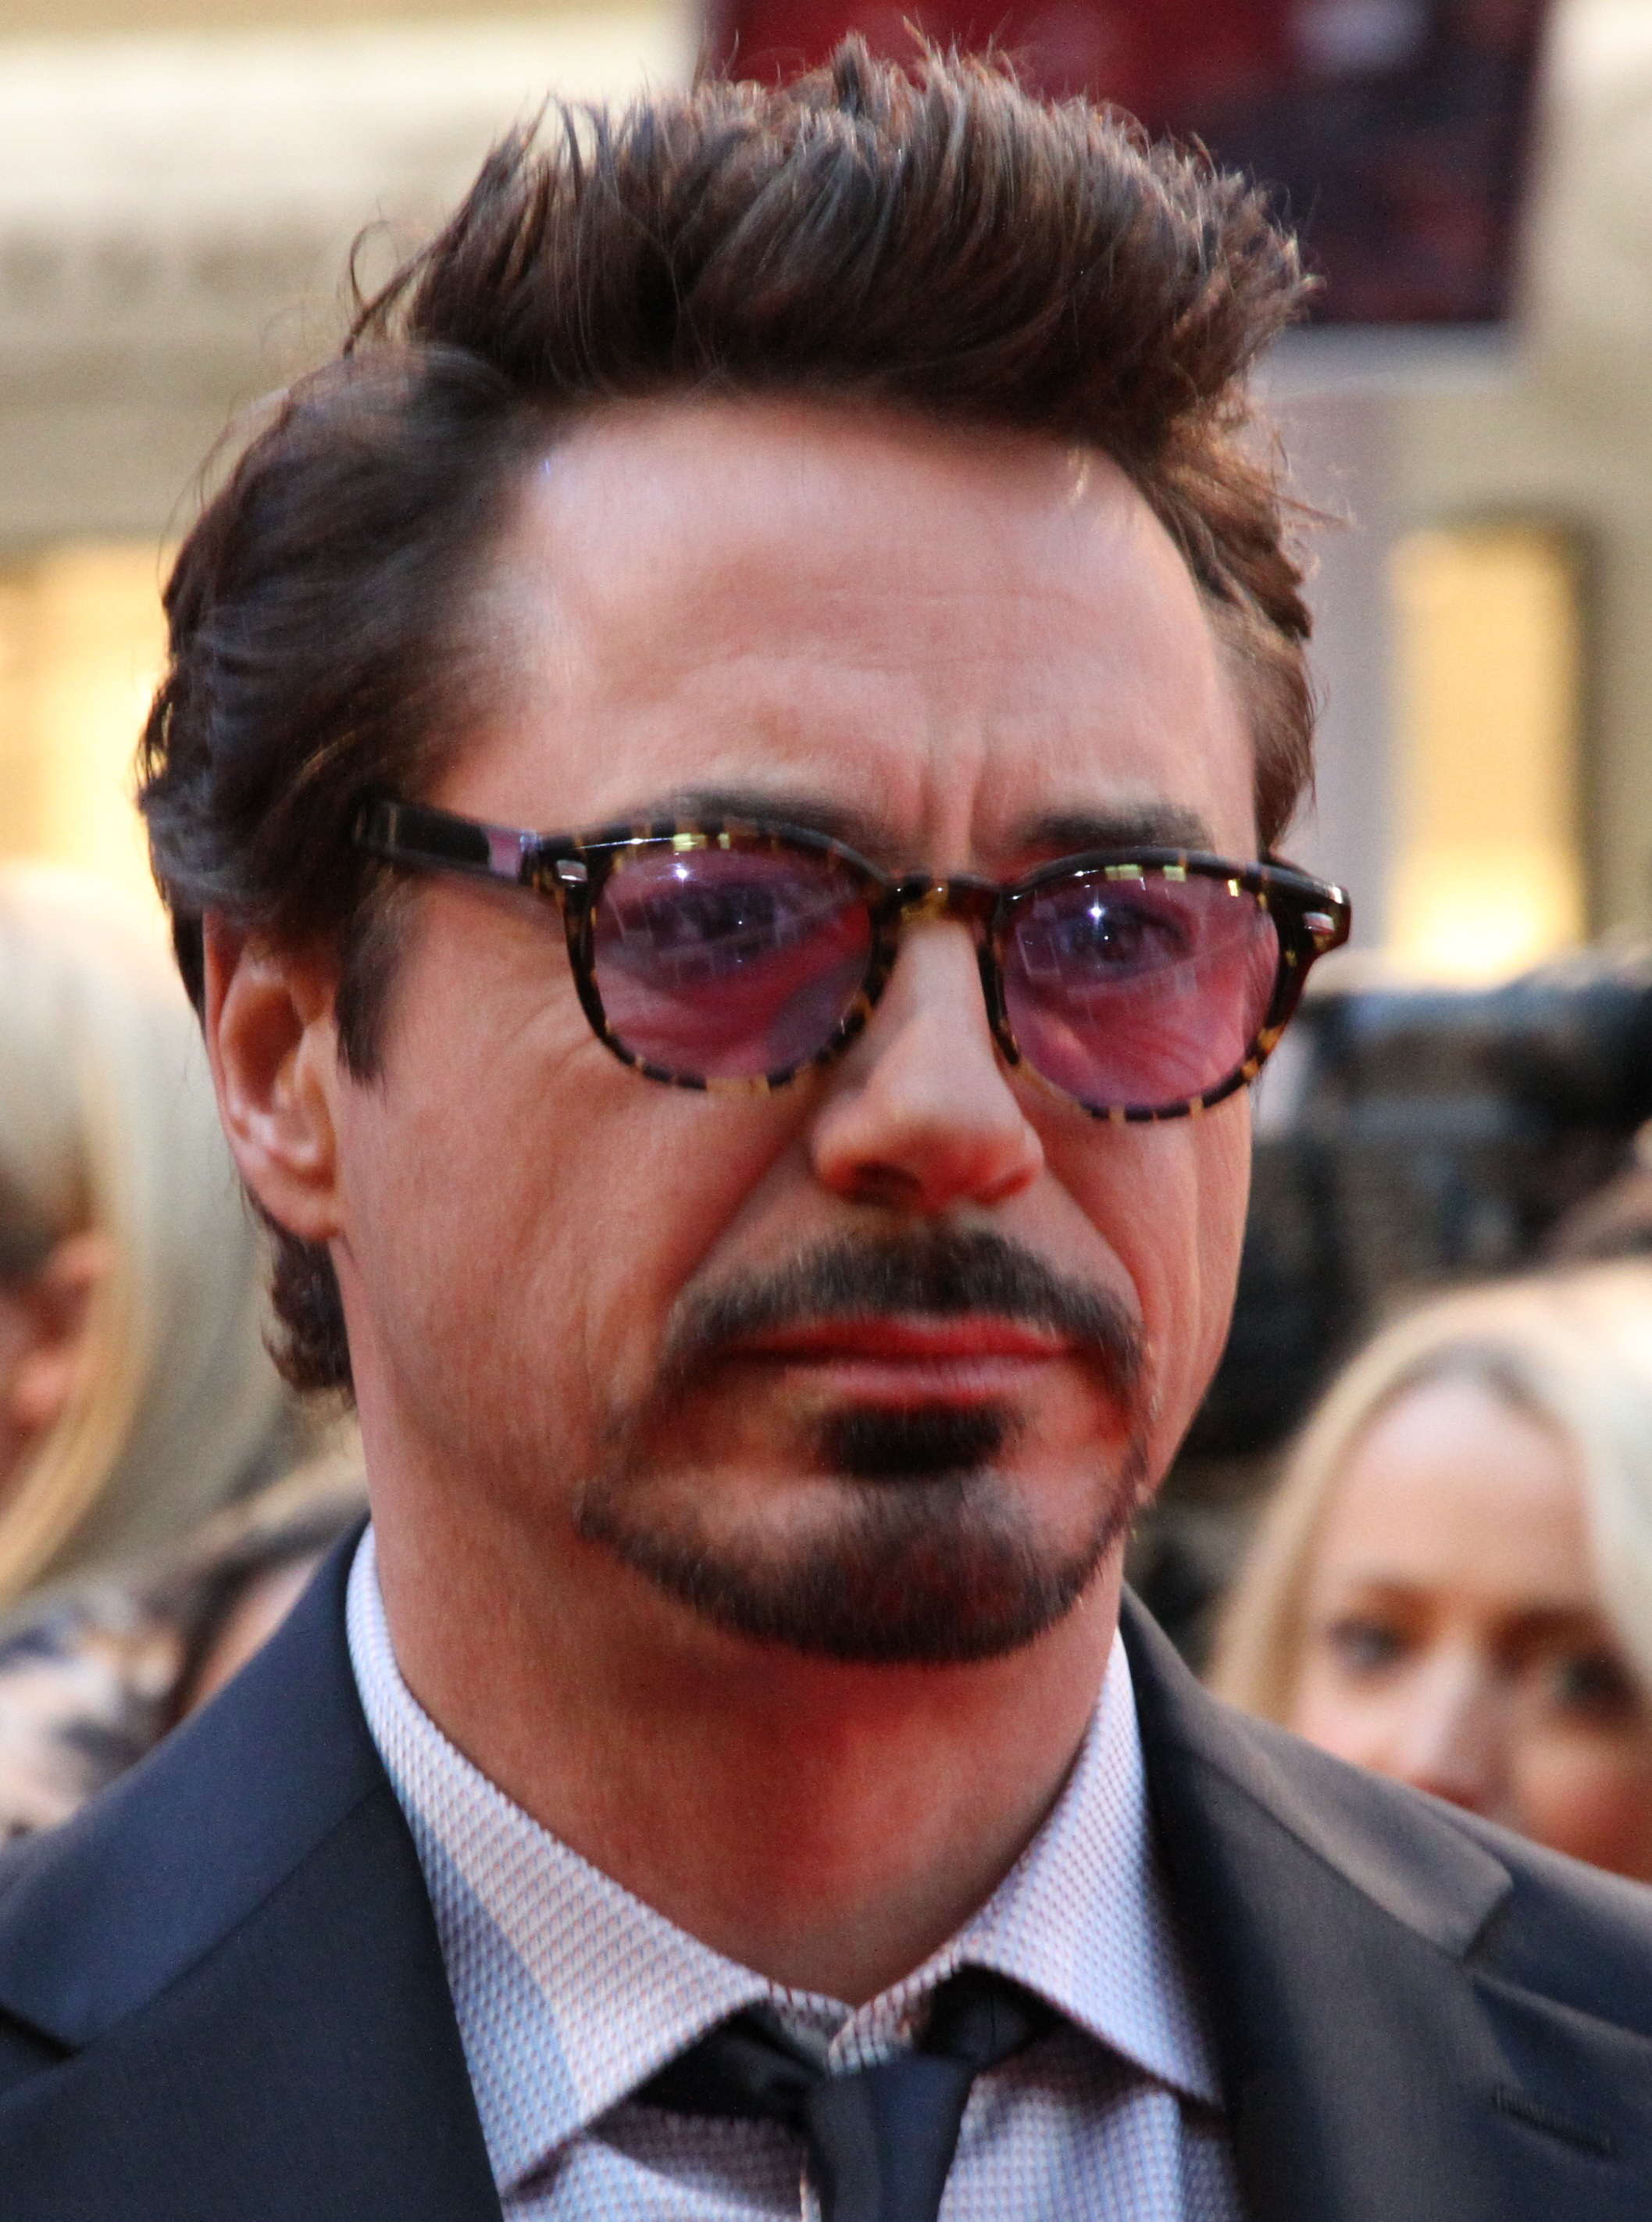 File:Robert Downey, Jr. 2012.jpg - Wikimedia Commons Robert Downey